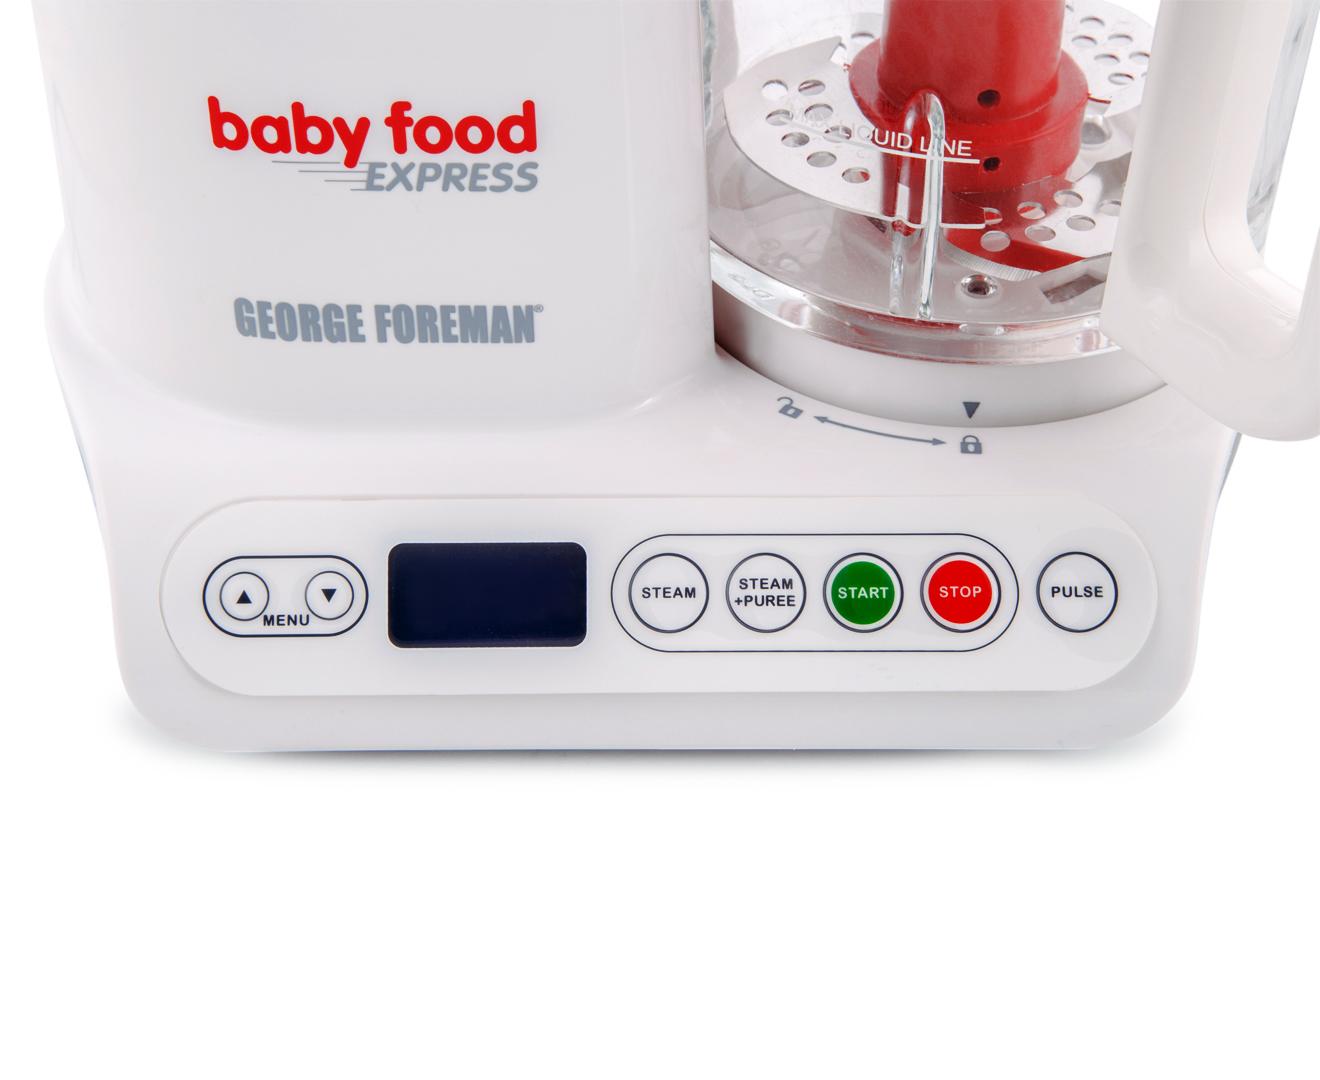 George Foreman Baby Food Express